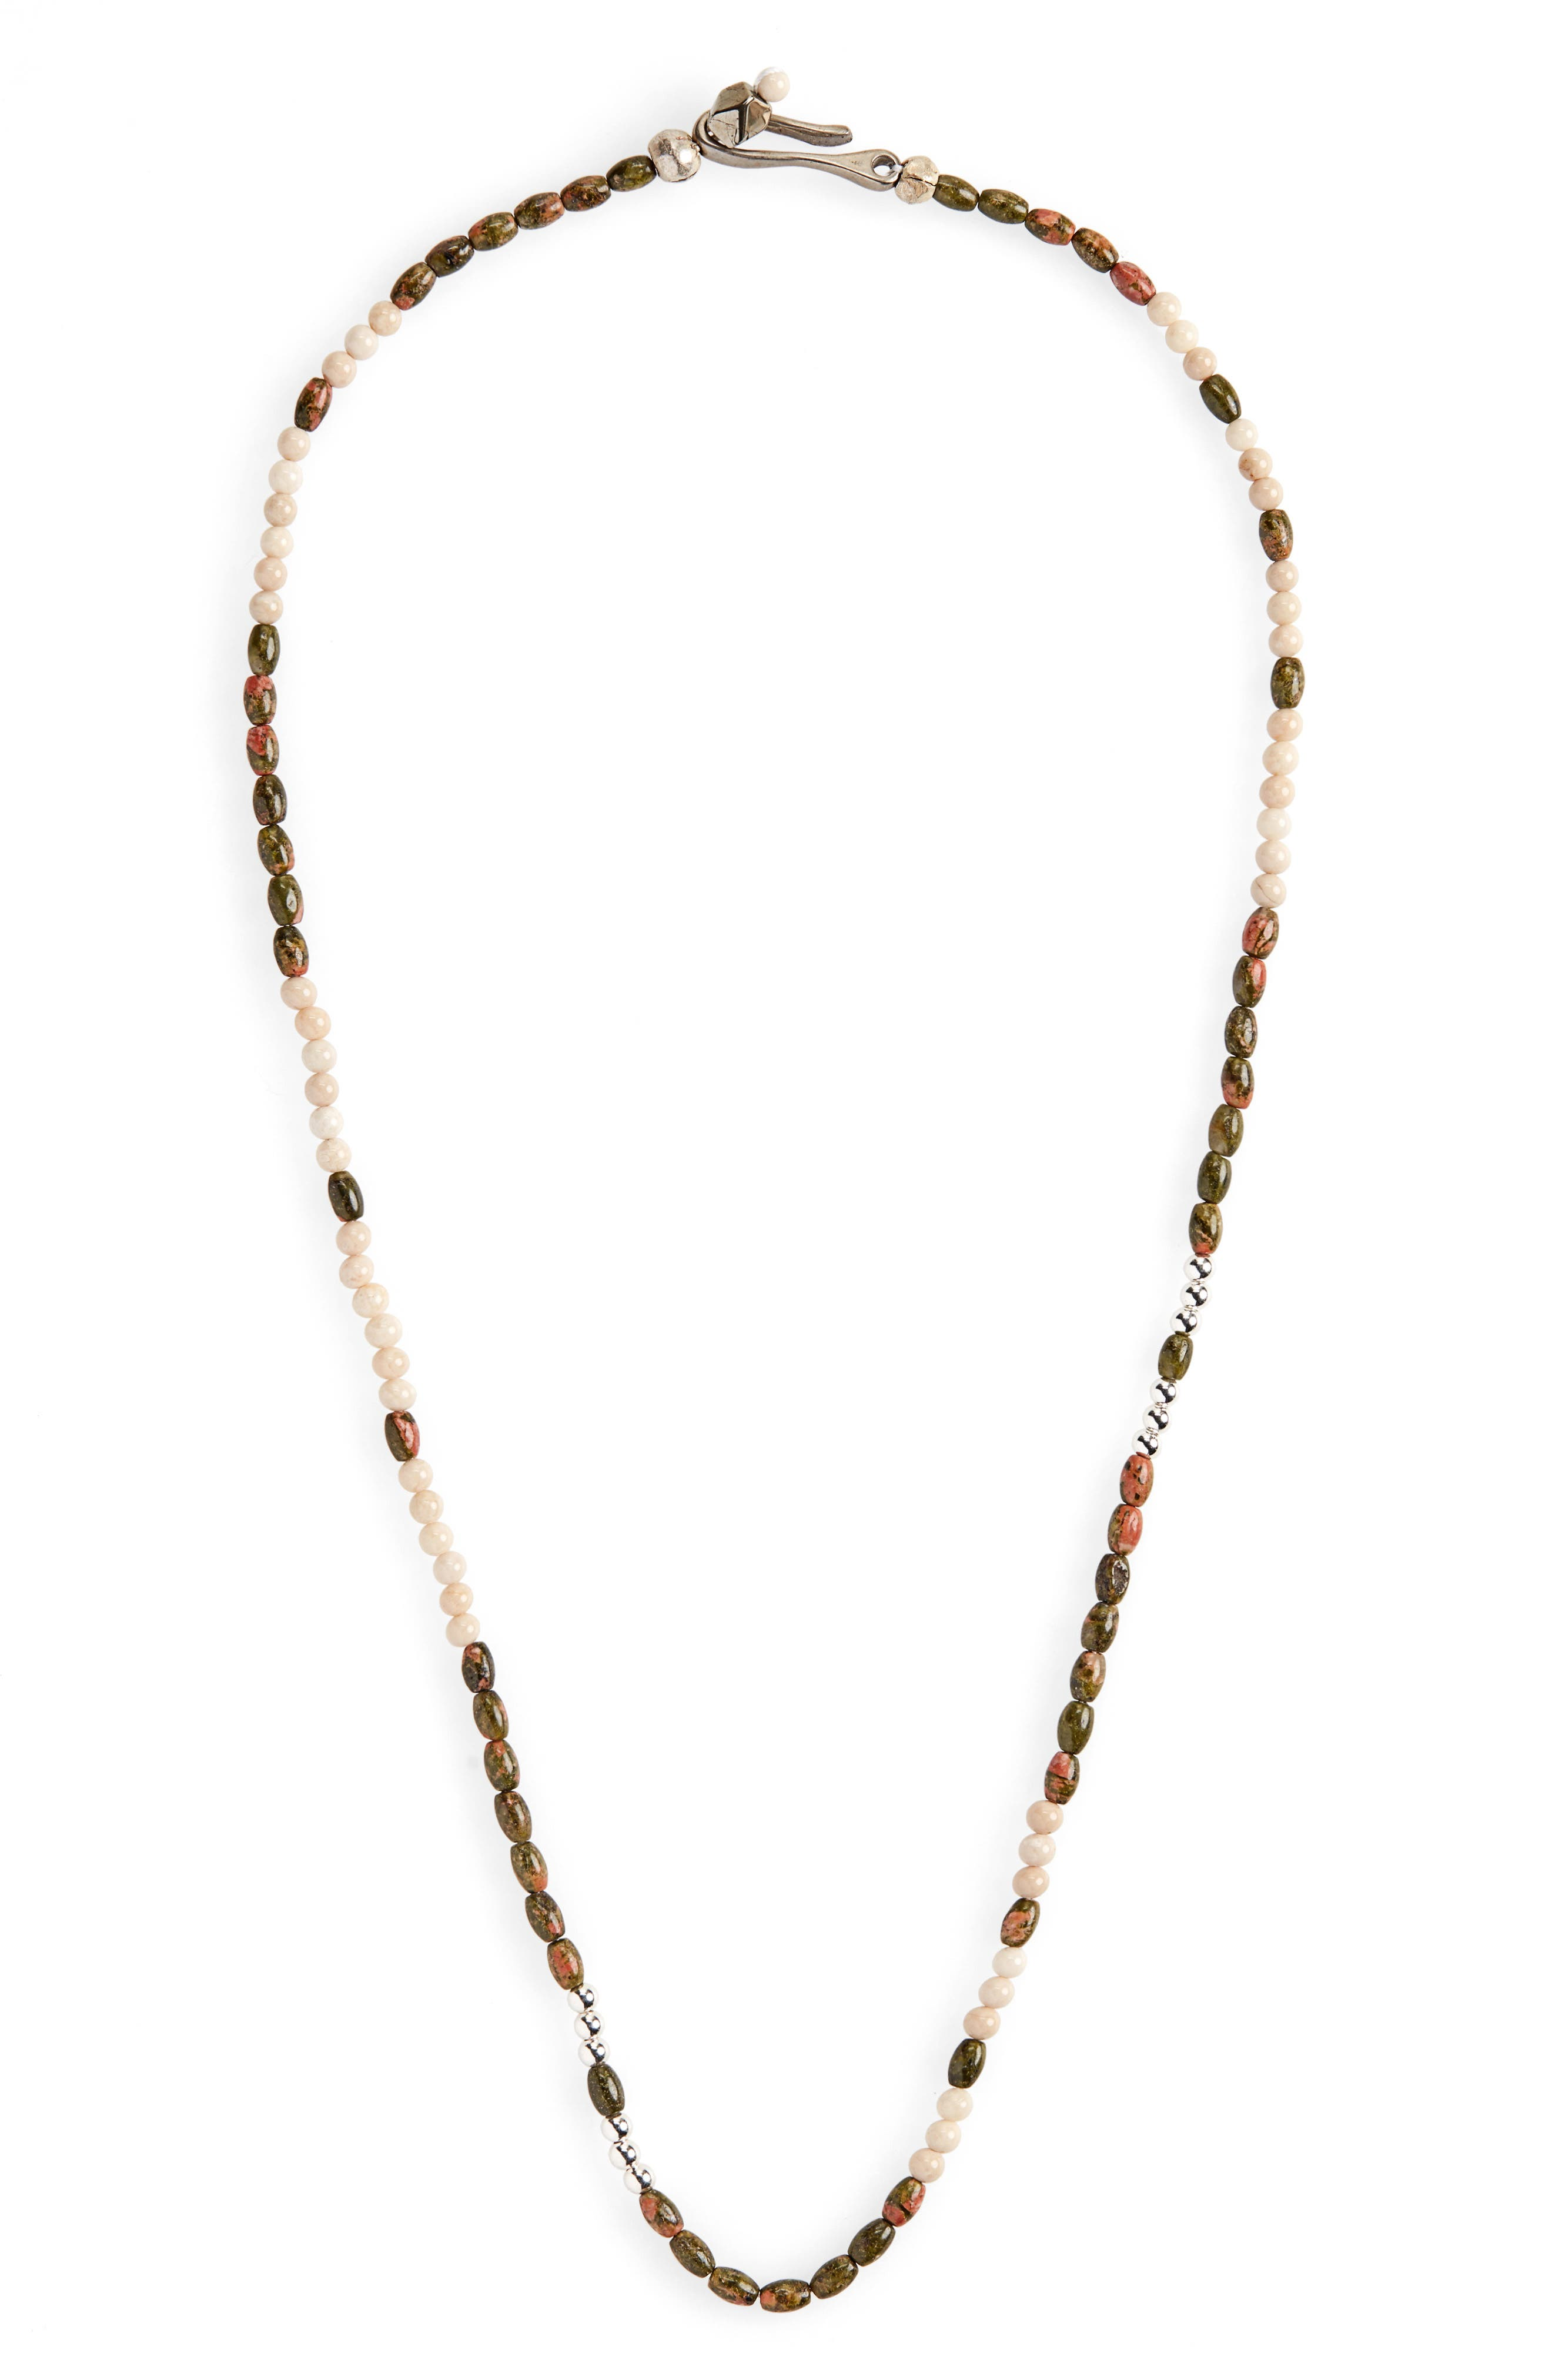 Morse Vision Necklace,                             Main thumbnail 1, color,                             WHITE/ BROWN